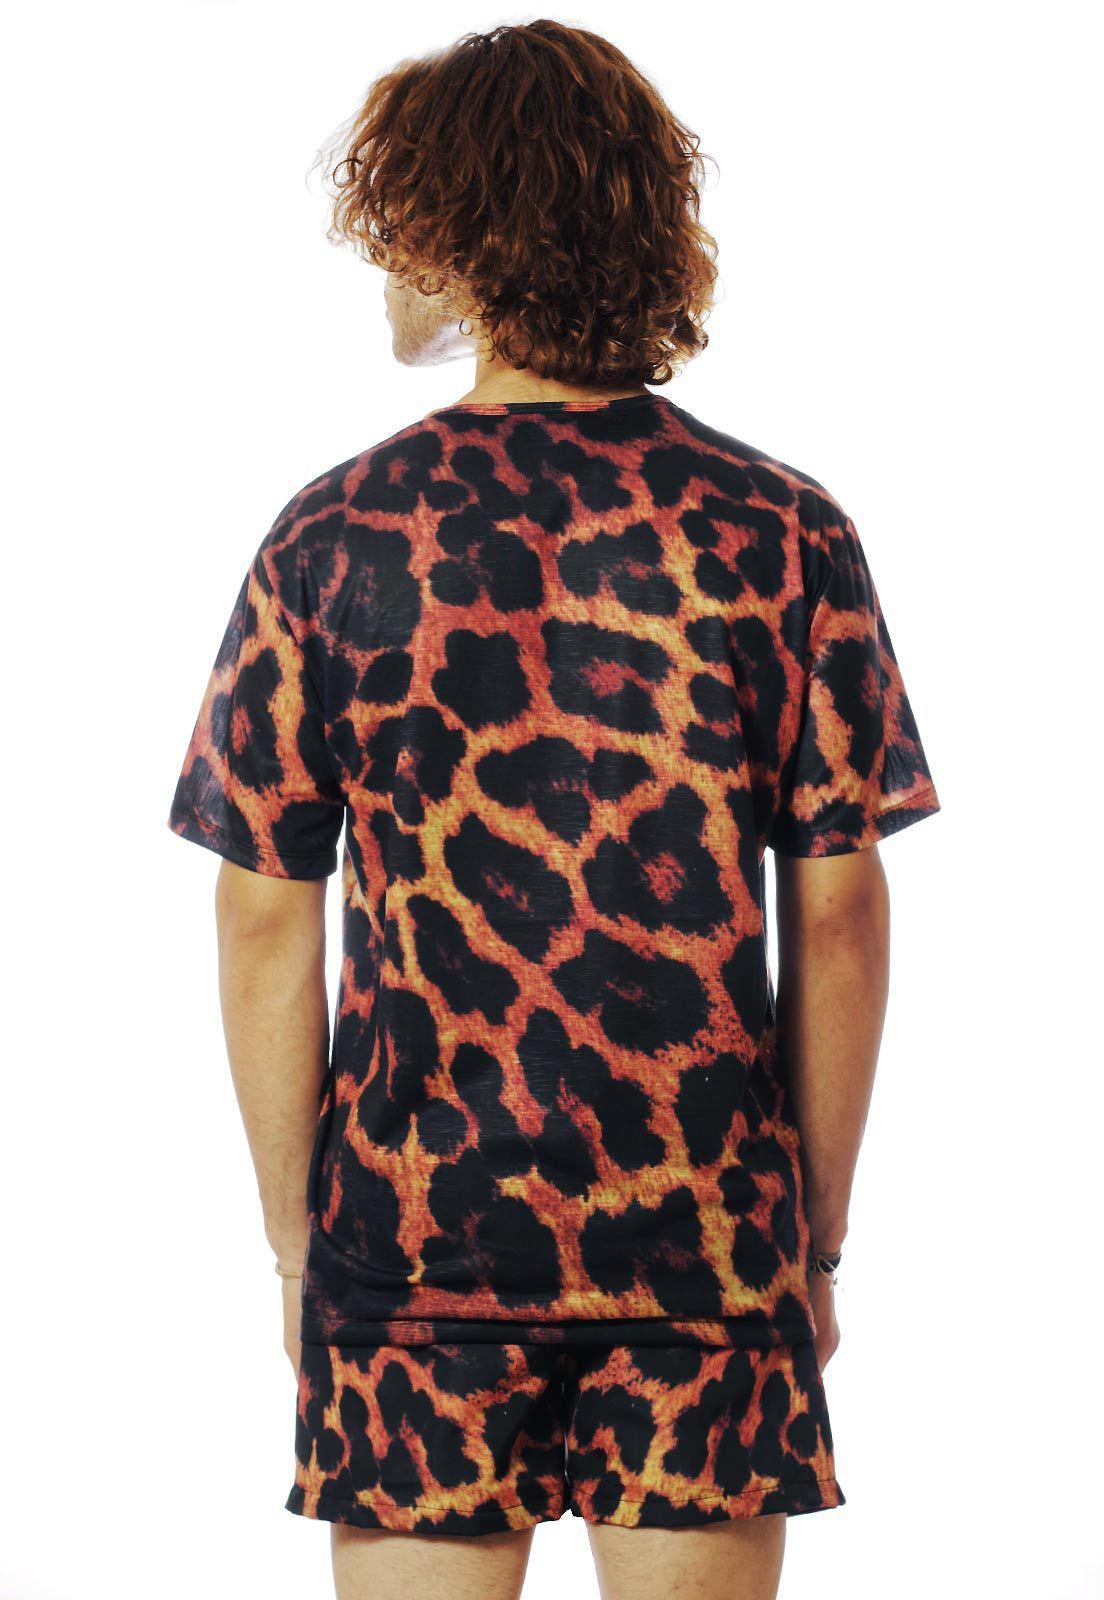 Conjunto Estampado Camiseta + Shorts Unissex Oncinha